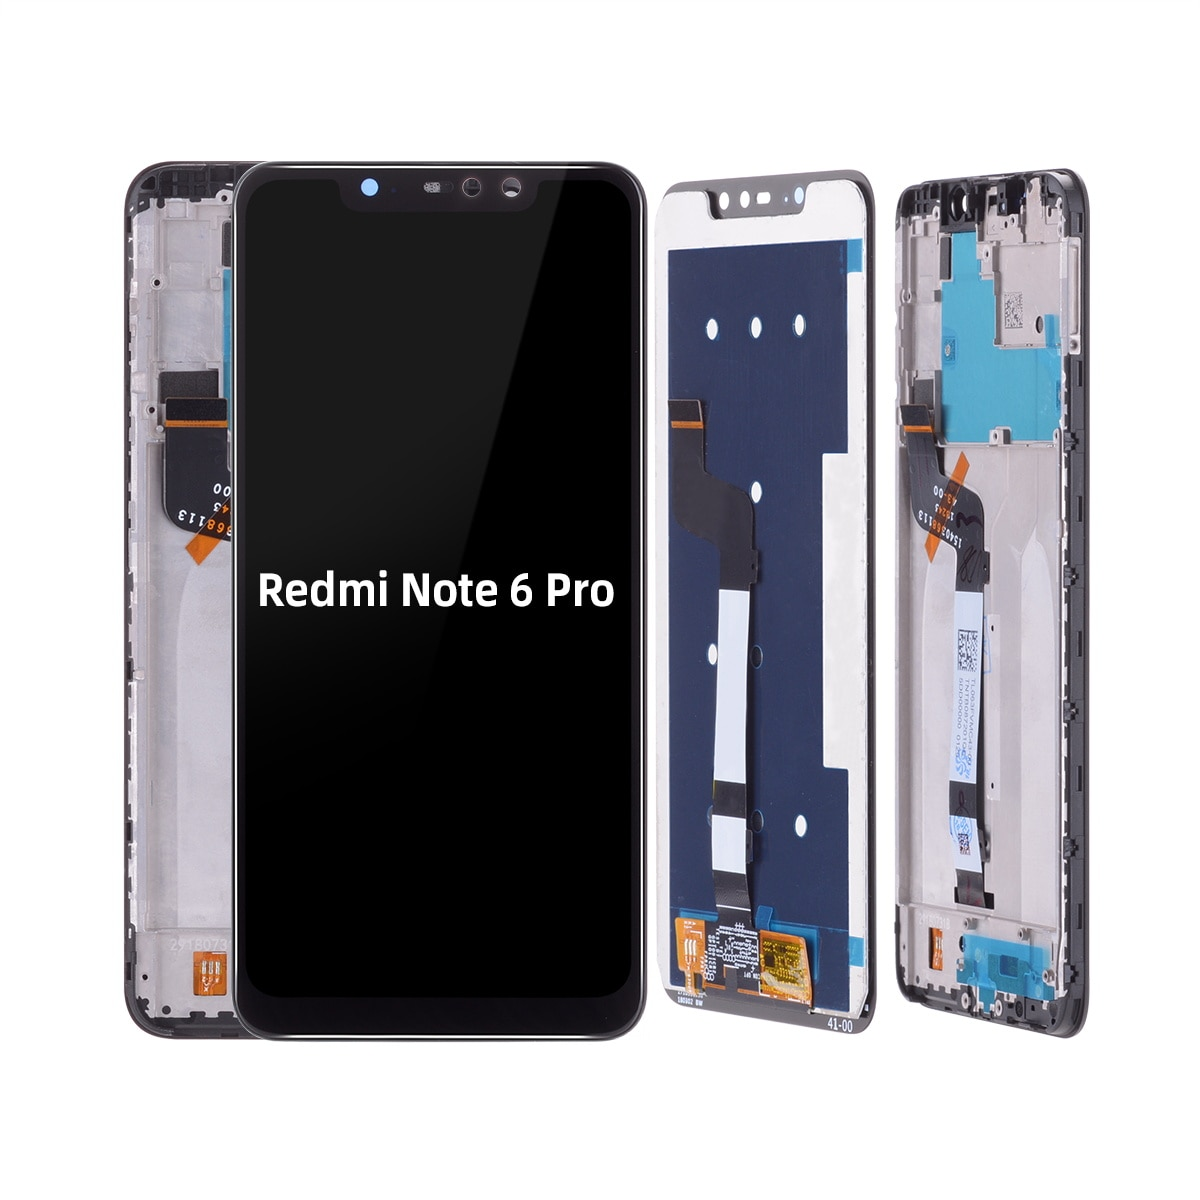 Xiaomei reemplazar en Xiaomei para Xiaomi módulo Redmi Note 6 Pro LCD reemplazar en reemplazo Xiaomei 6,26 pulgadas